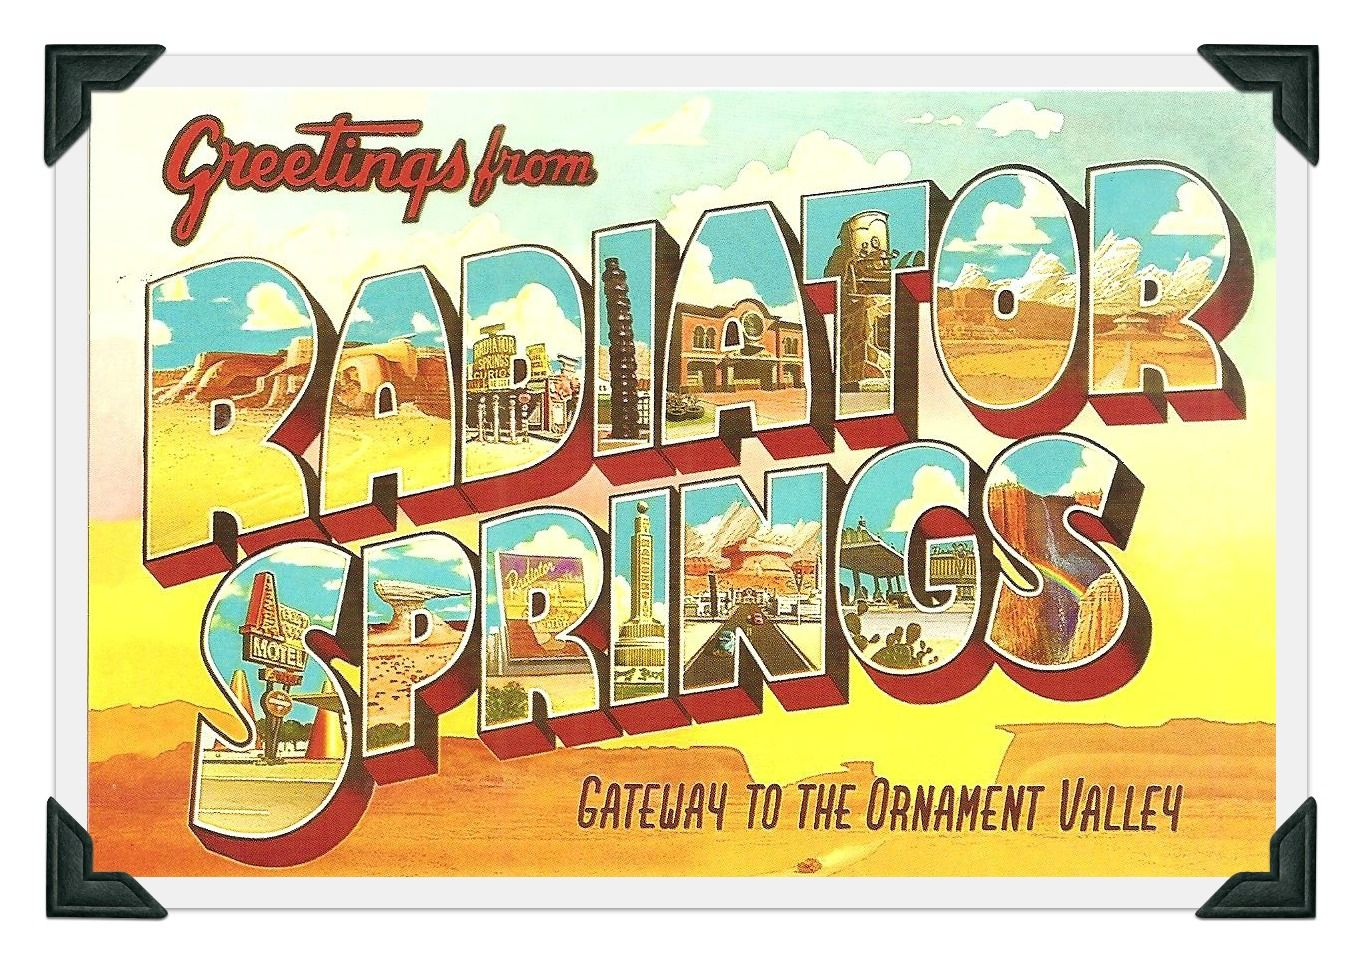 Radiator Springs Wallpapers - Top Free Radiator Springs ...